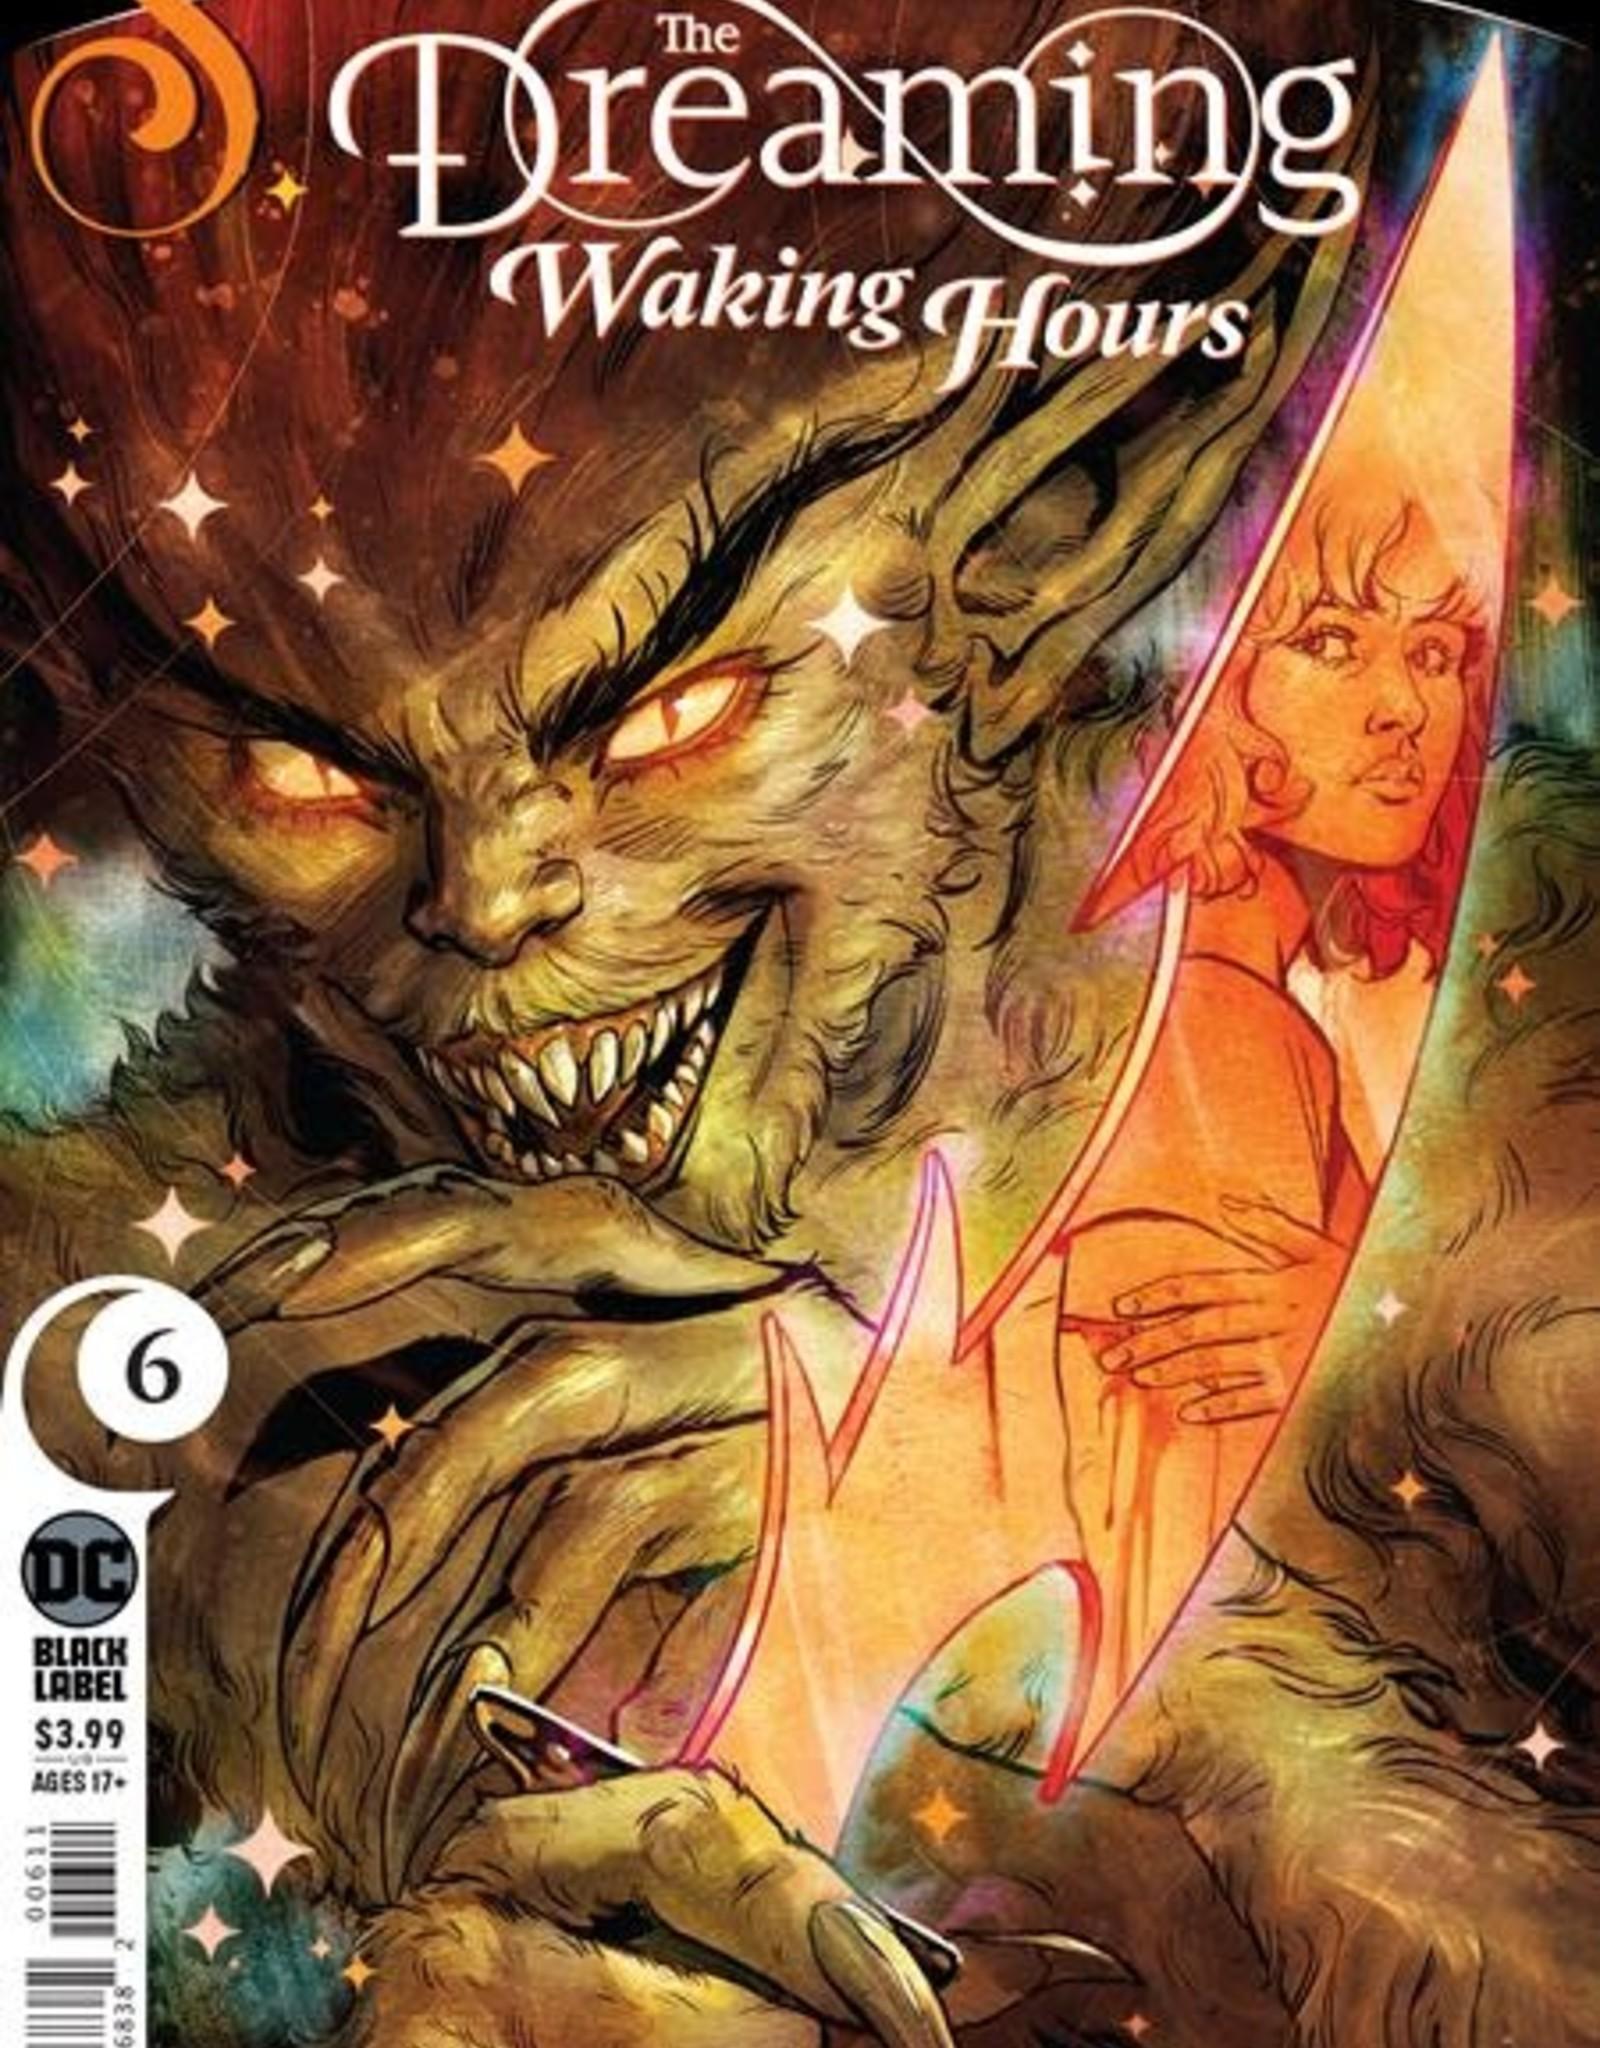 DC Comics Dreaming Waking Hours #6